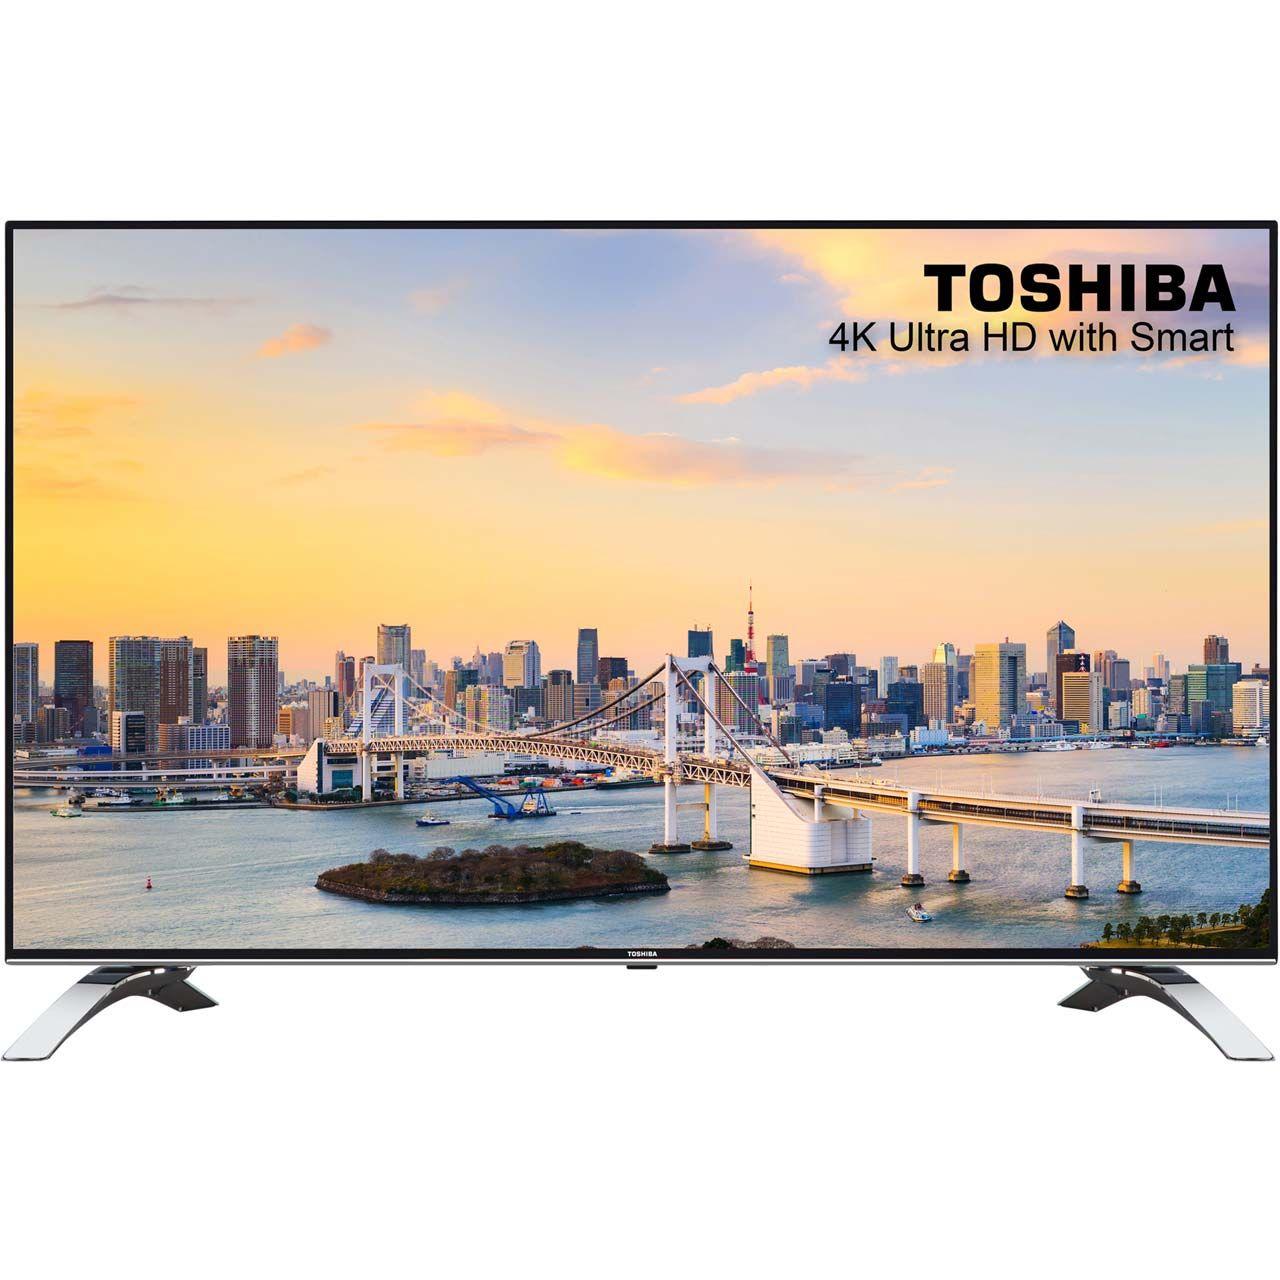 "Toshiba 43U6663DB  43"" Smart 4K UHD TV £279 at ao.com"